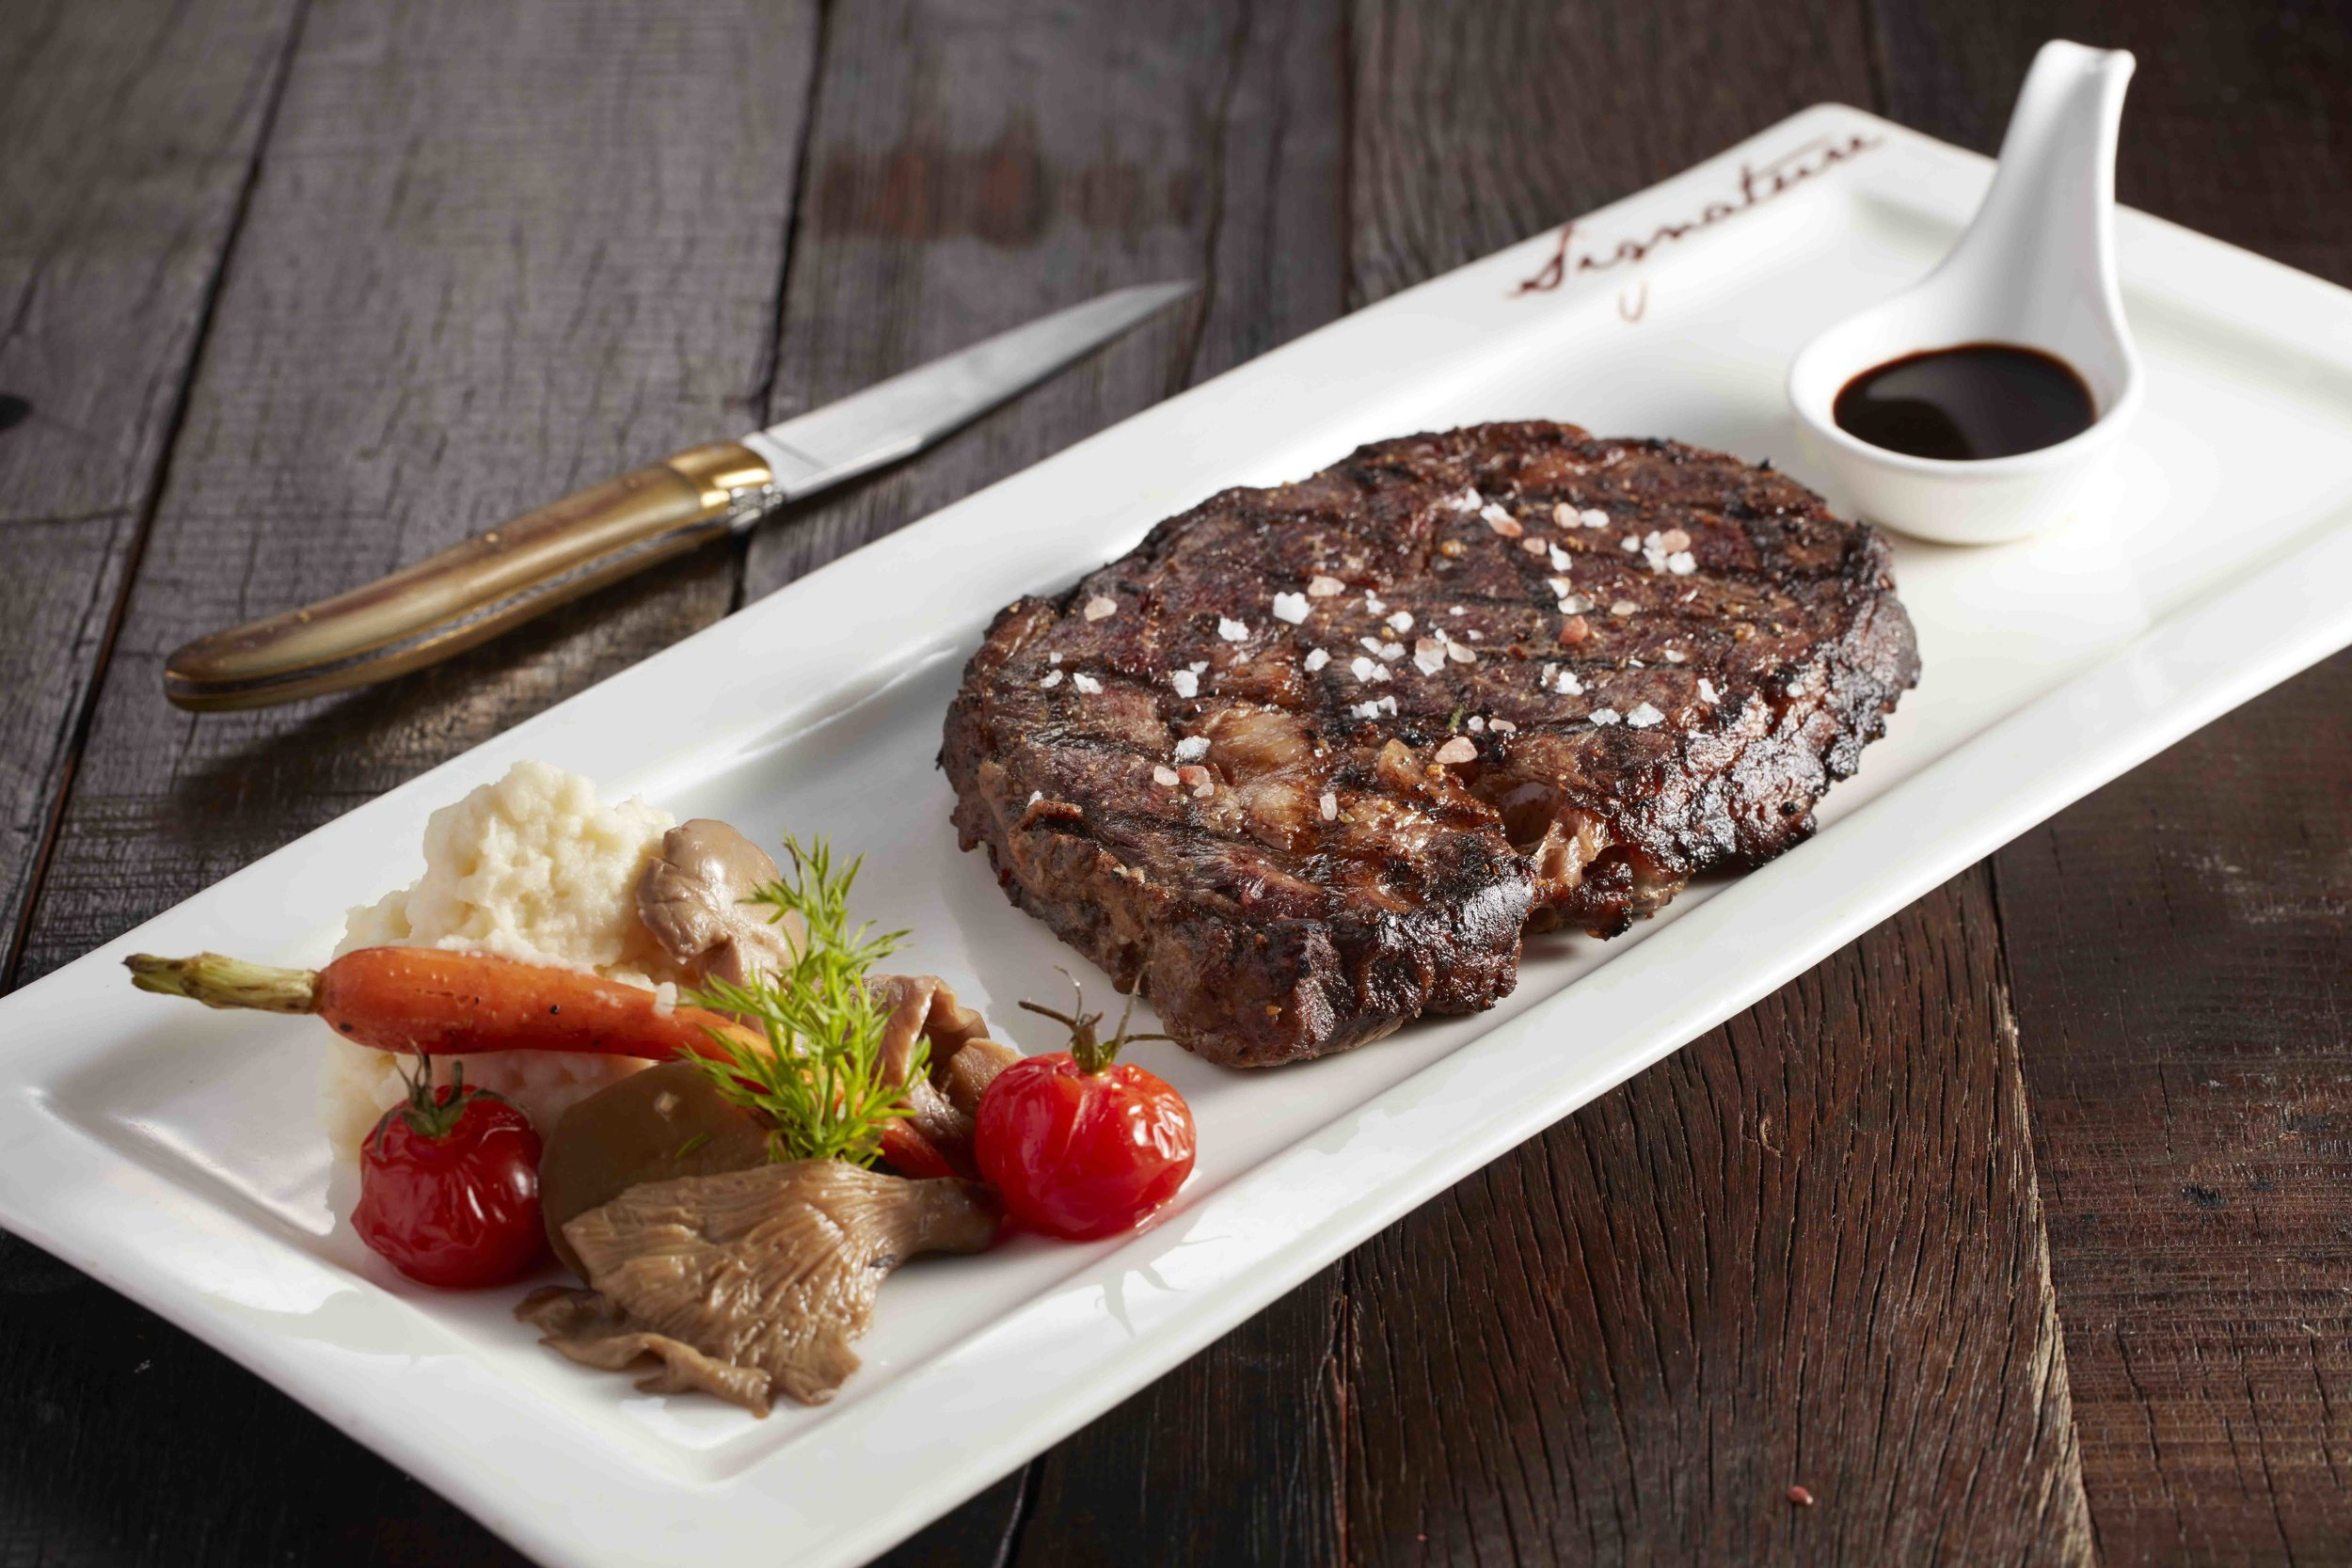 20160915 Mr Steak40700.jpg